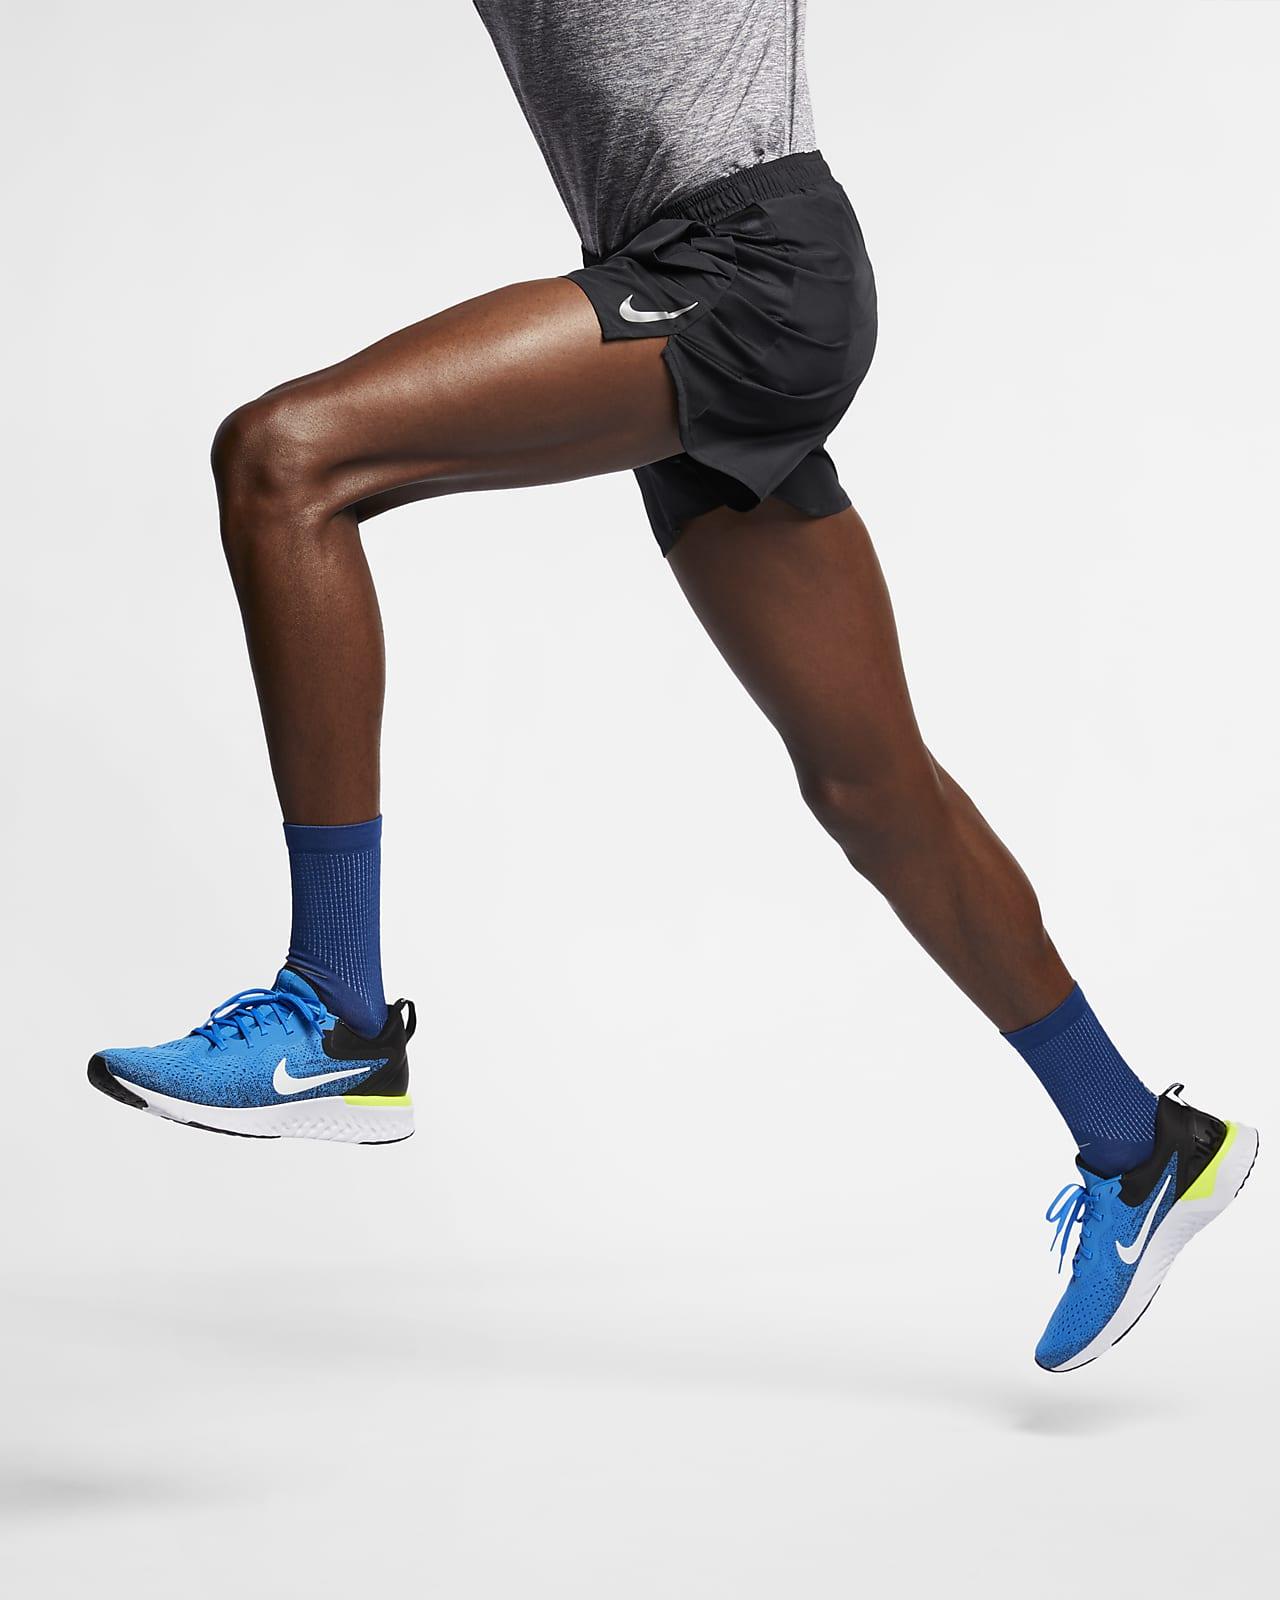 Pánské běžecké kraťasy Nike Challenger s všitými slipy (délka 13 cm)